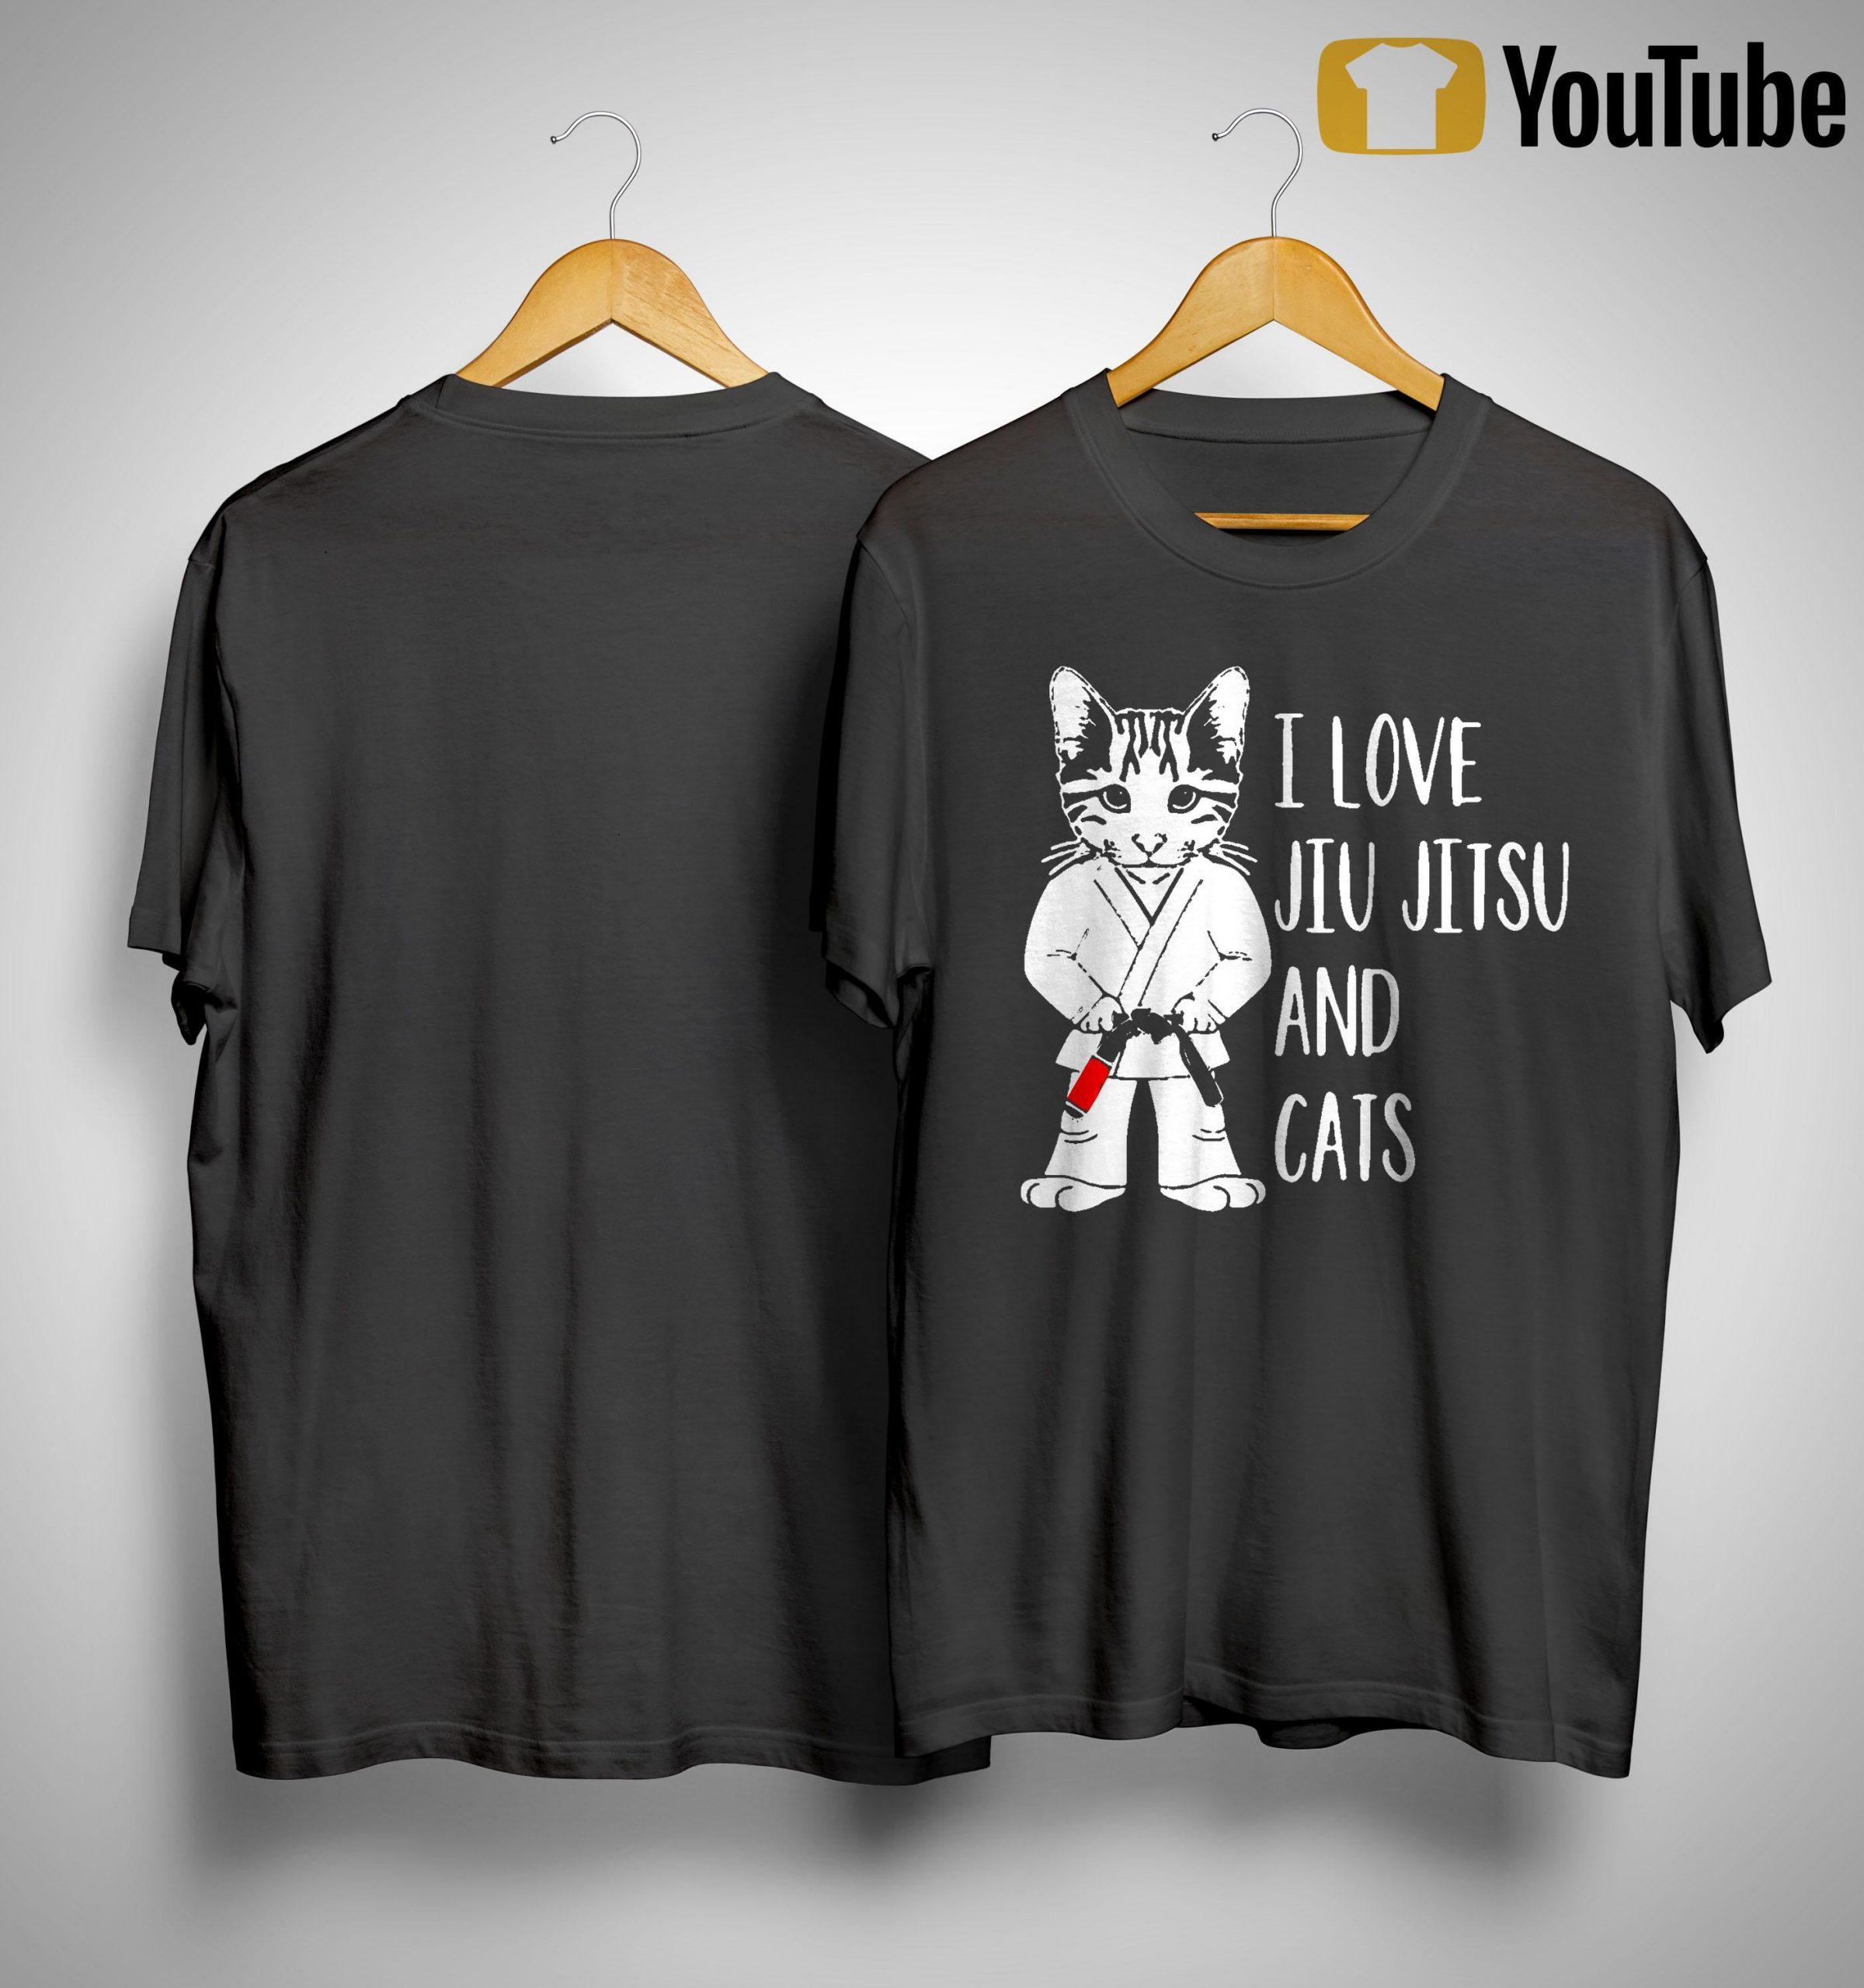 I Love Jiu Jitsu And Cats Shirt